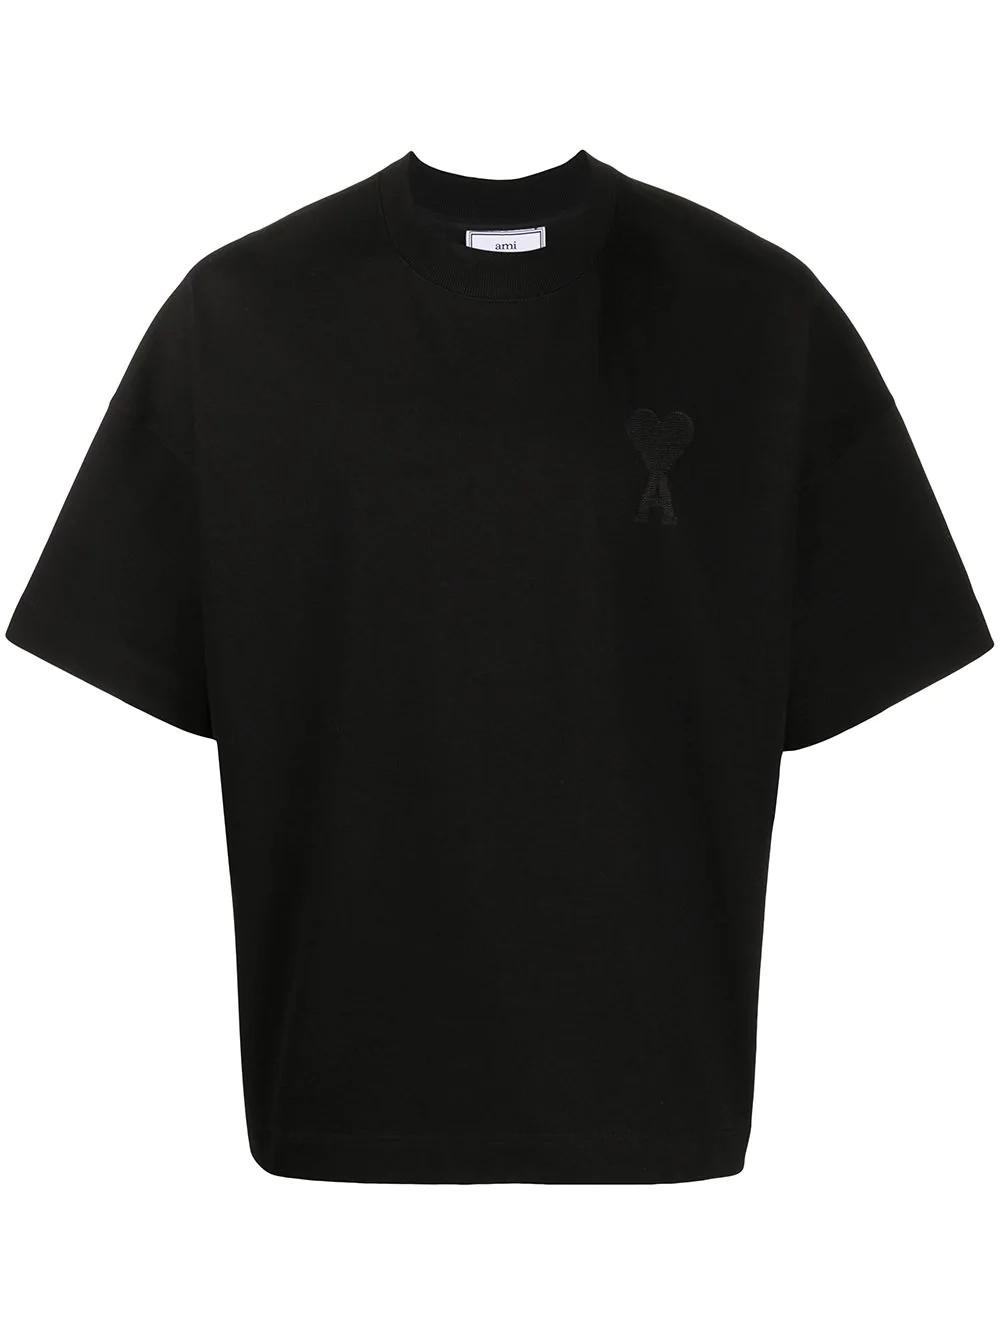 H20HJ133 79 001 BLACK